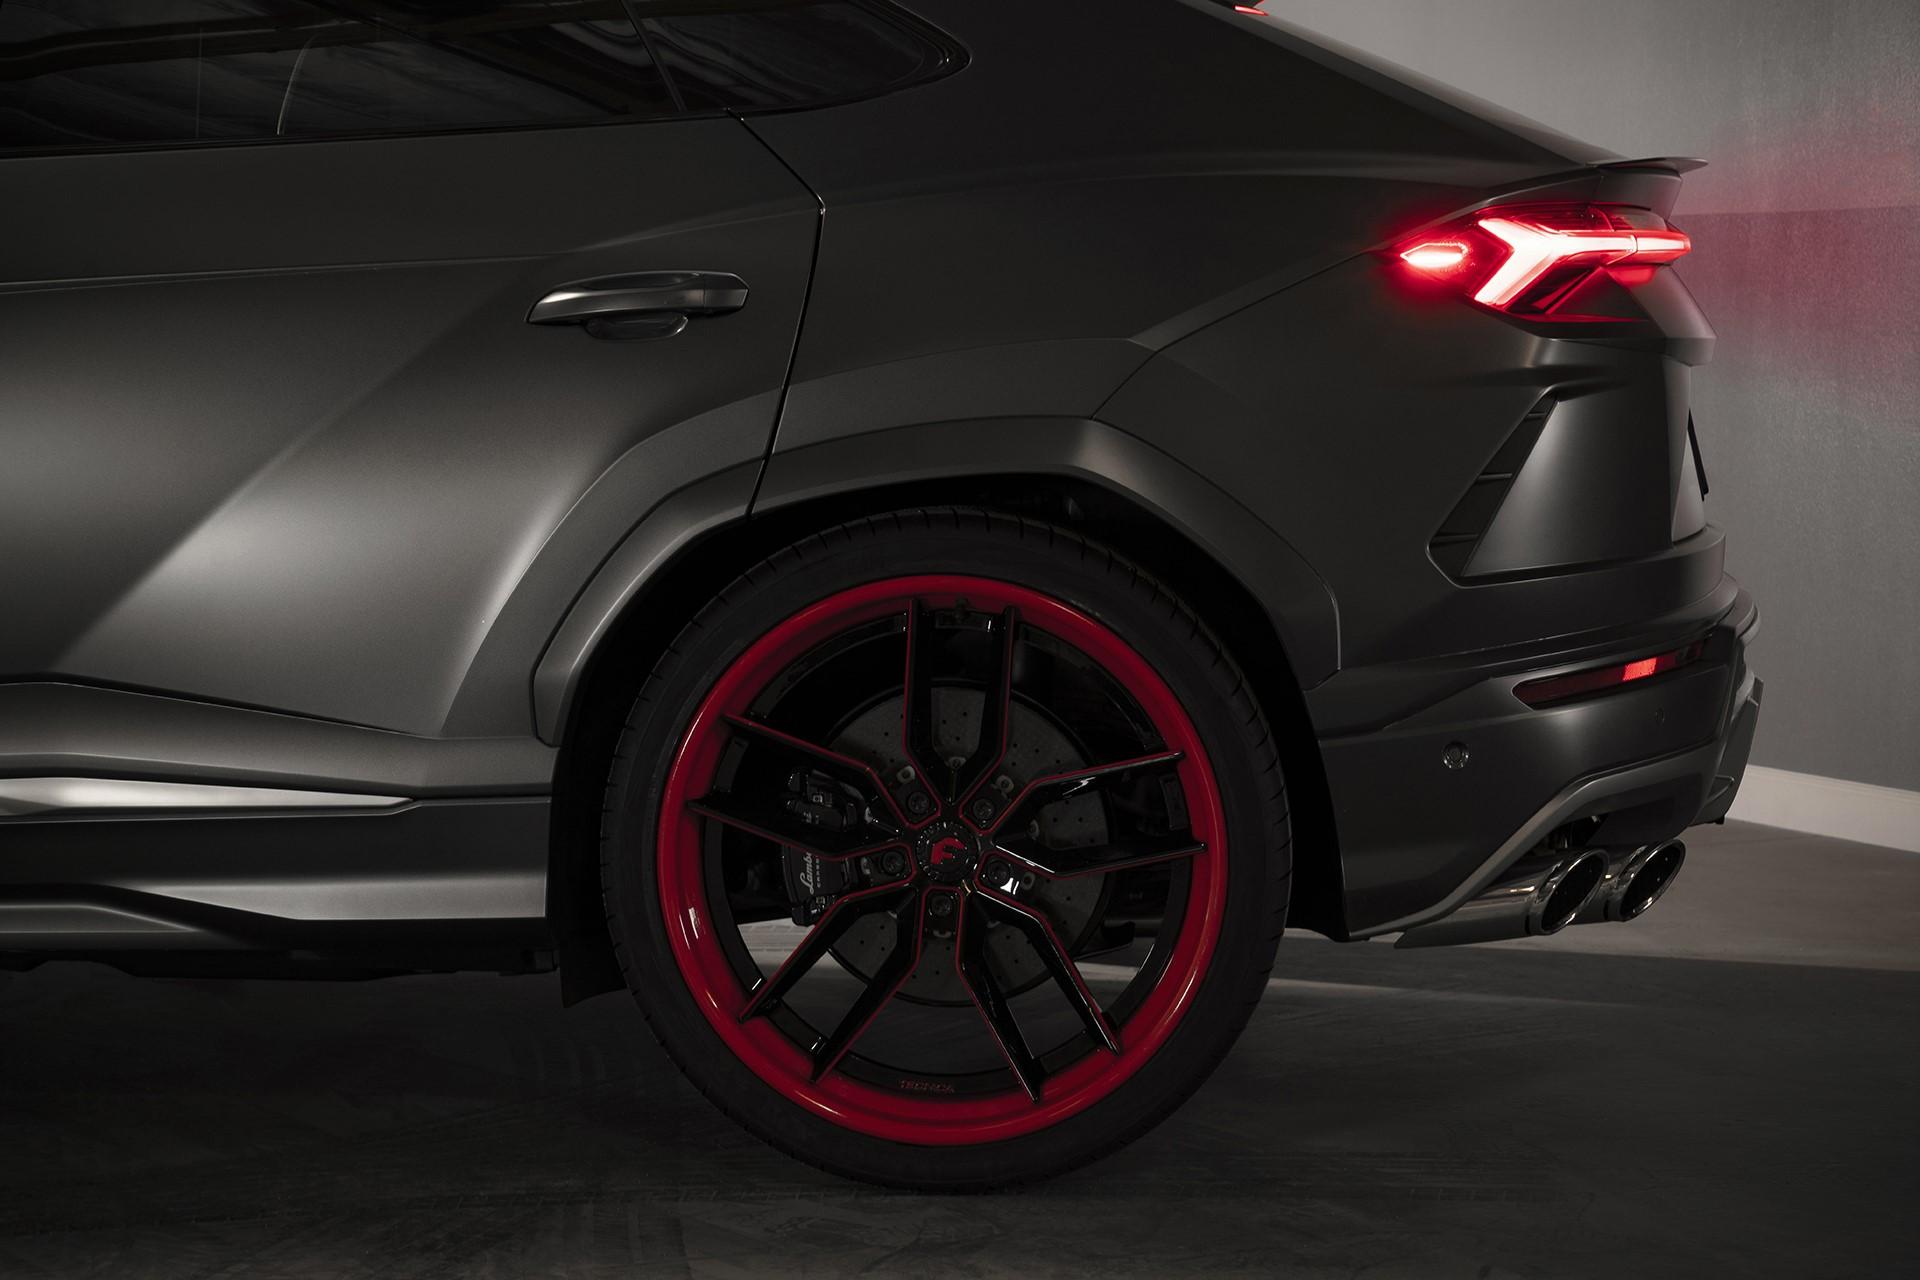 forgiato-custom-wheel-lamborghini-urus-tec_3.9-tecnica-12-21-2018_5c1d5c1351a84_4